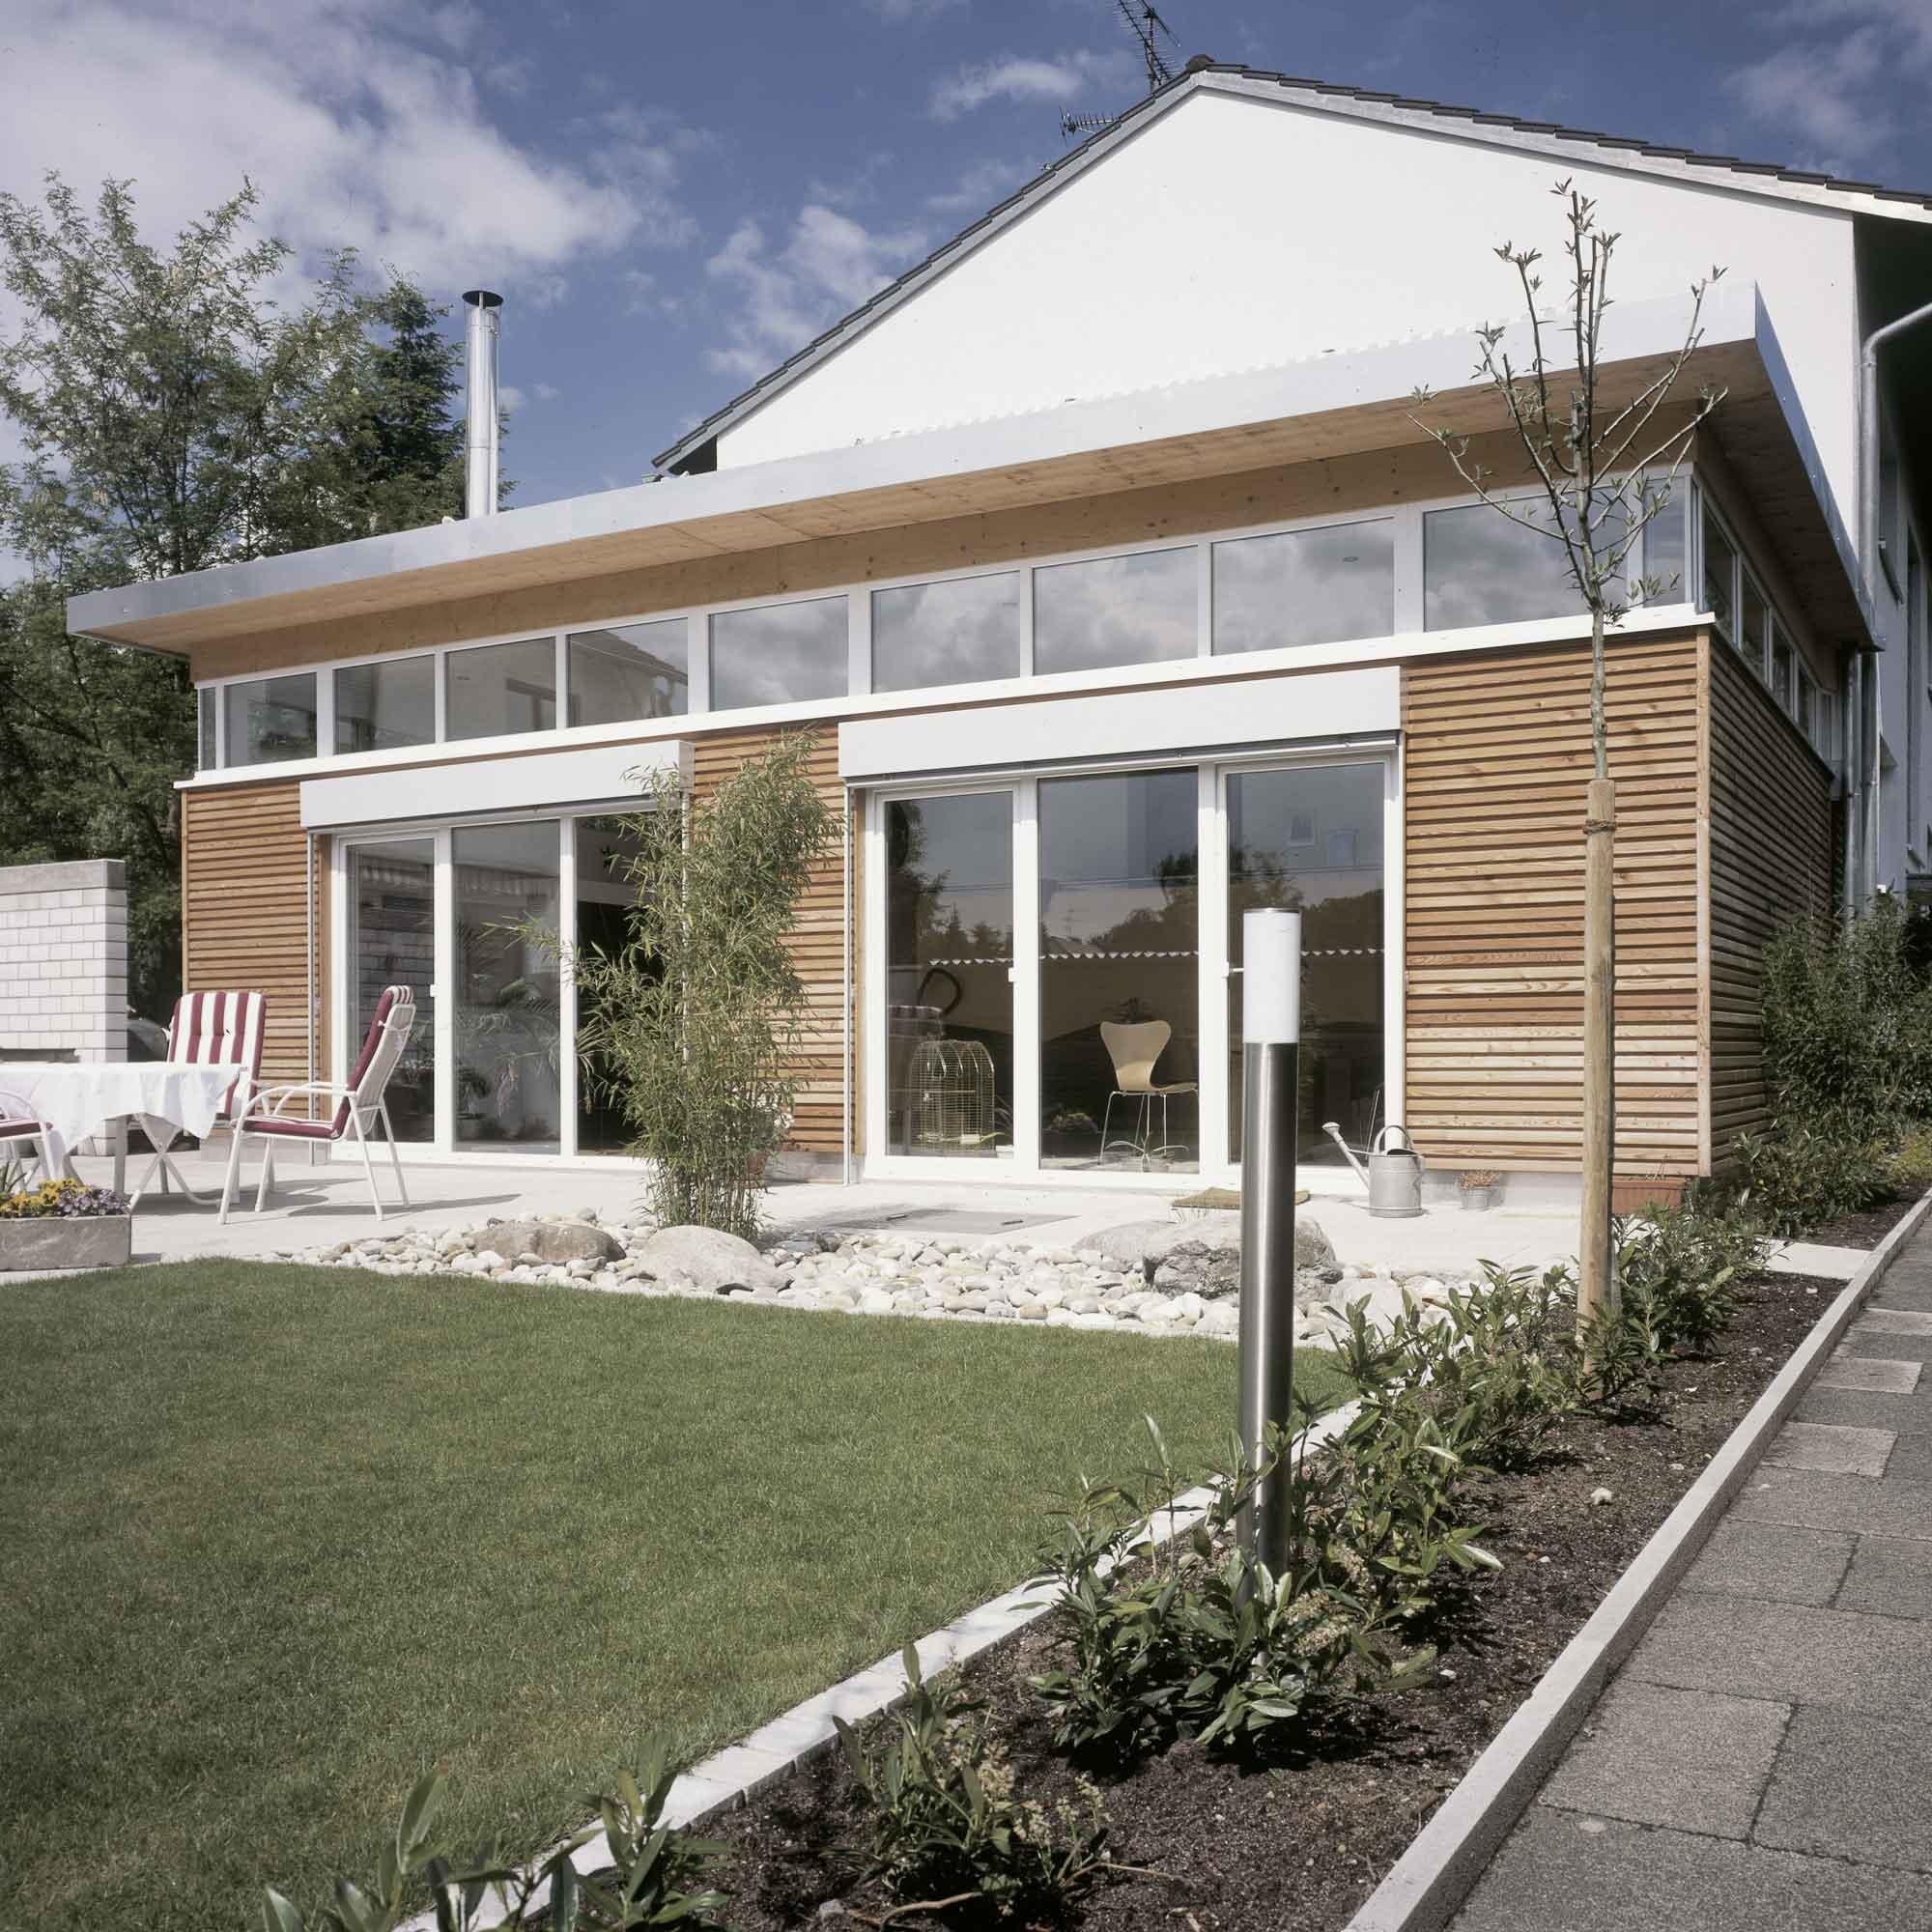 Holzfassade Landhausstil – HolzLand Verbeek